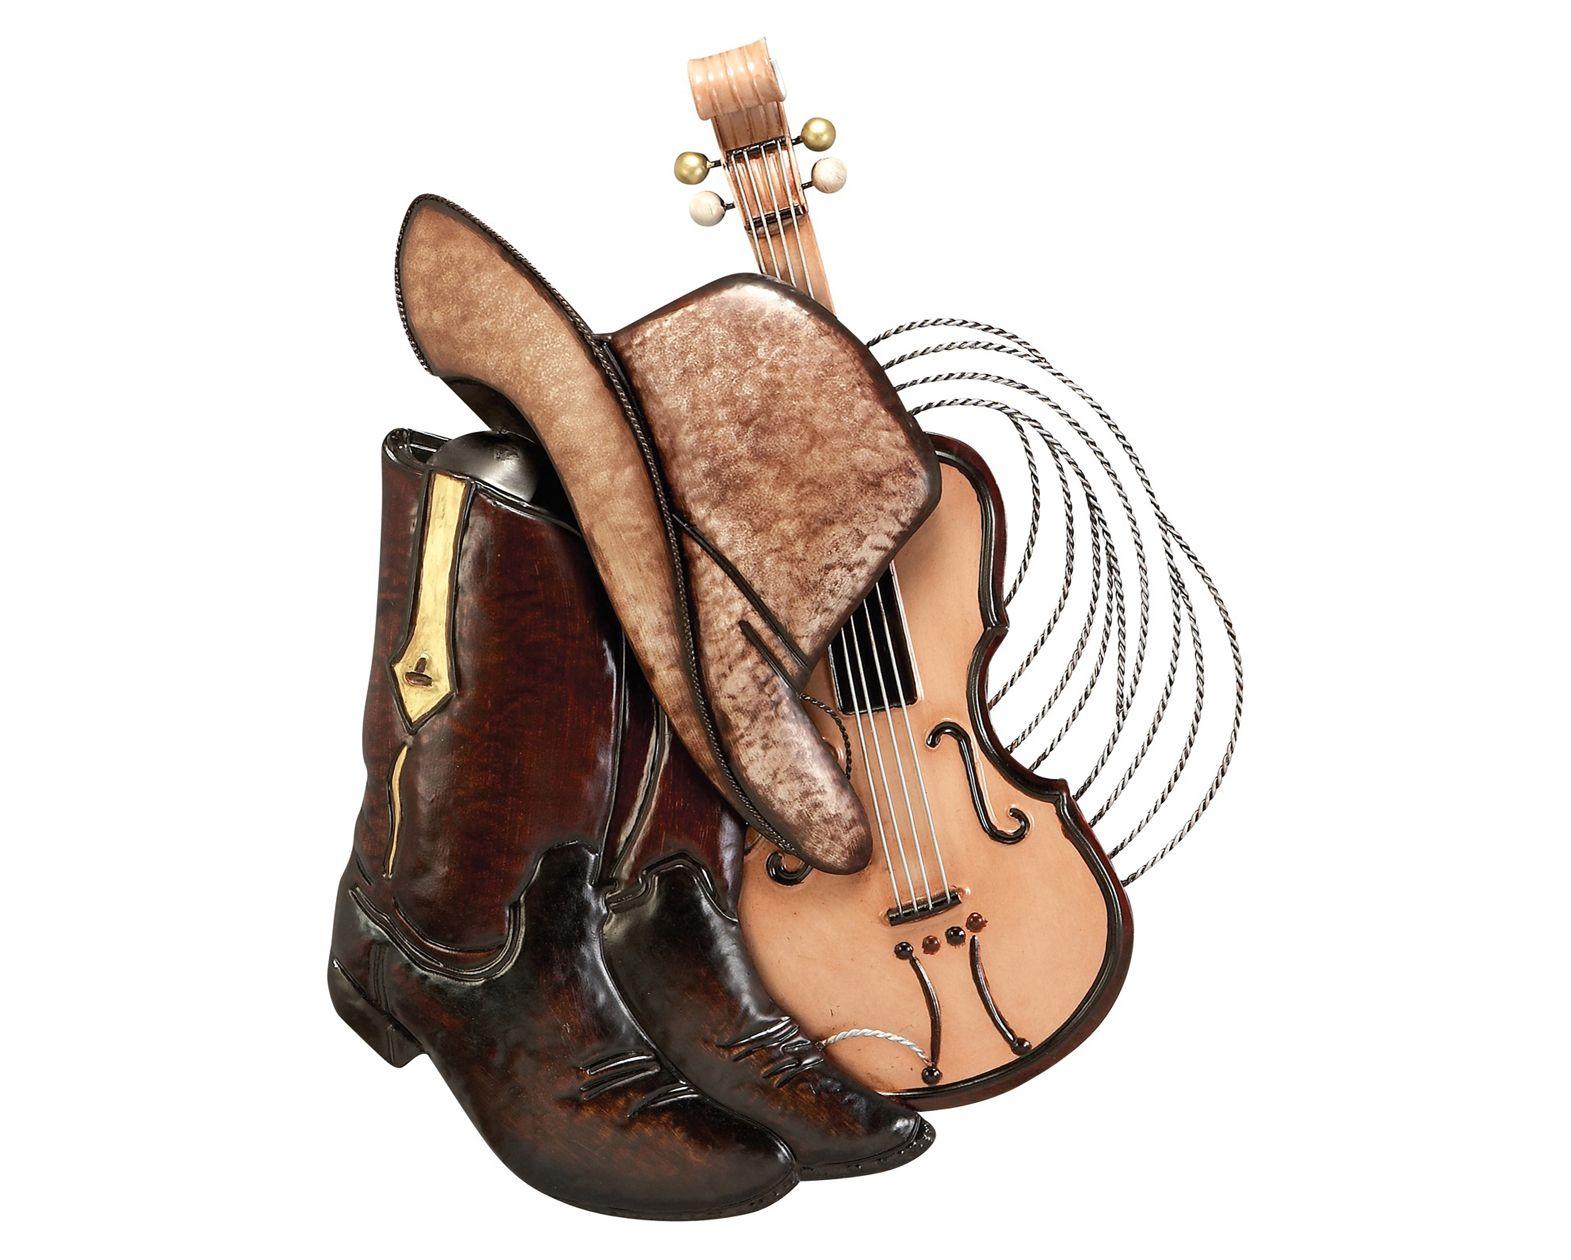 Cowboy Boots, Hat & Guitar